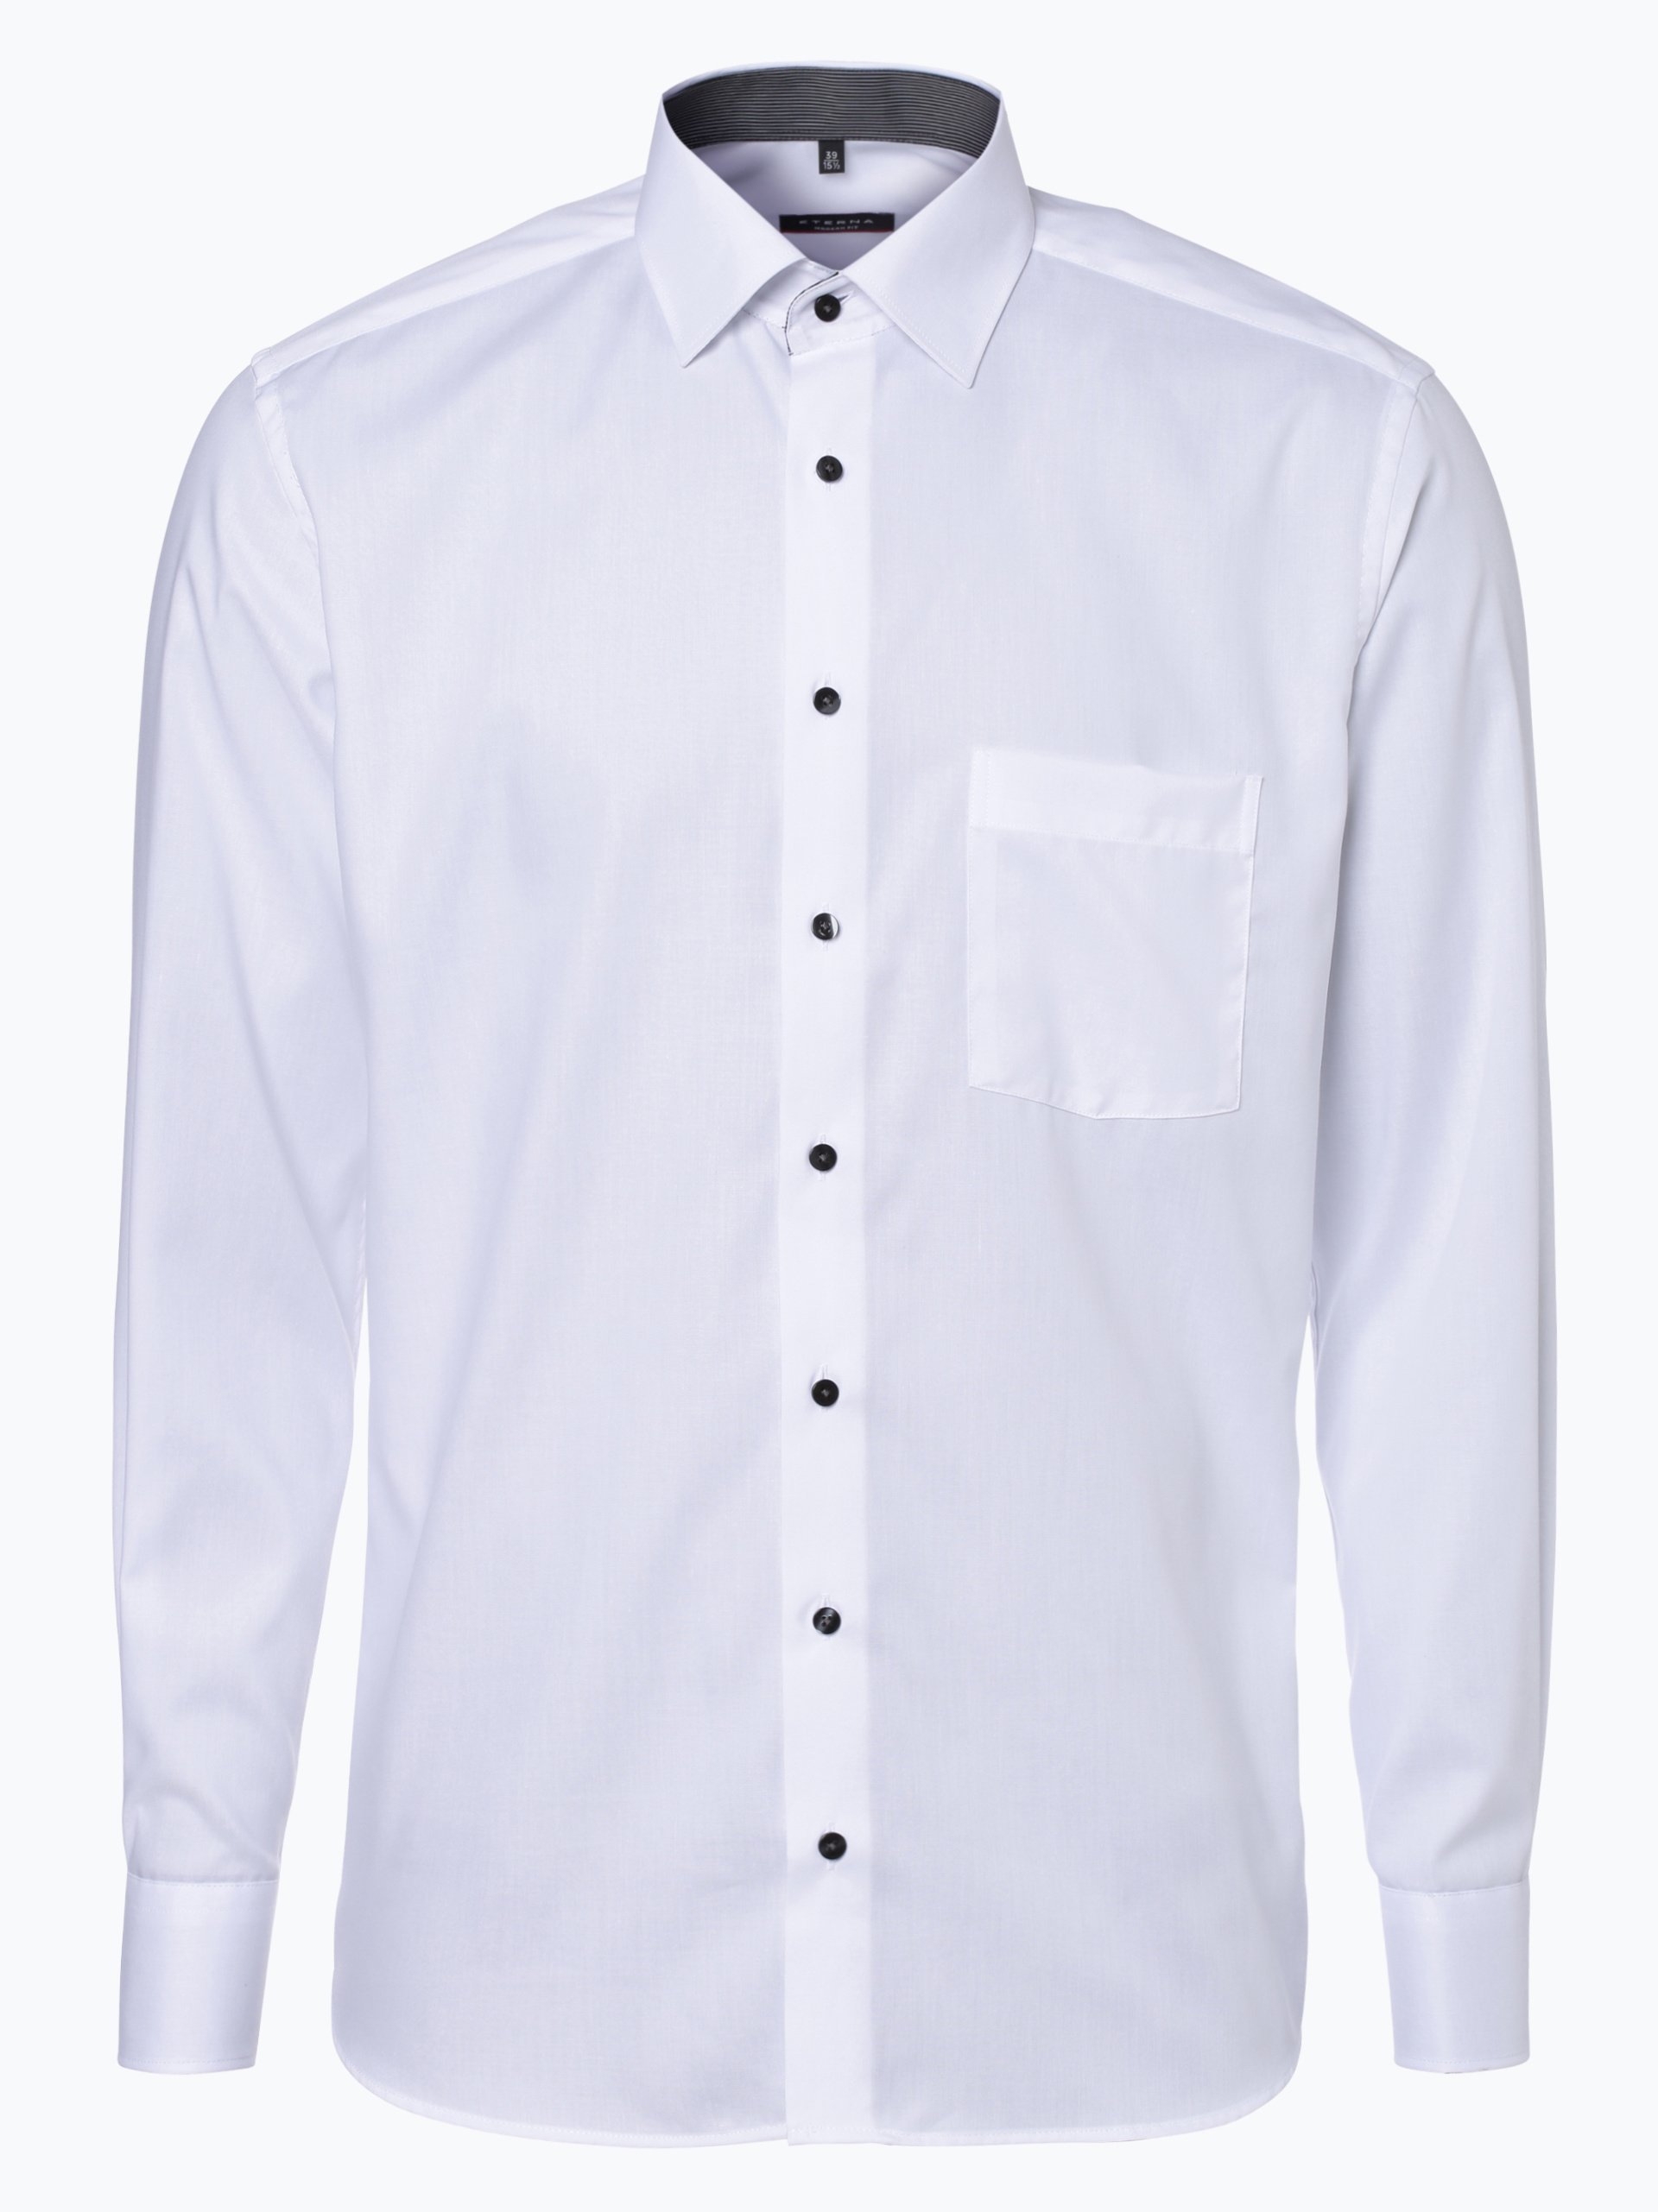 Eterna Modern Fit Herren Hemd Bügelfrei